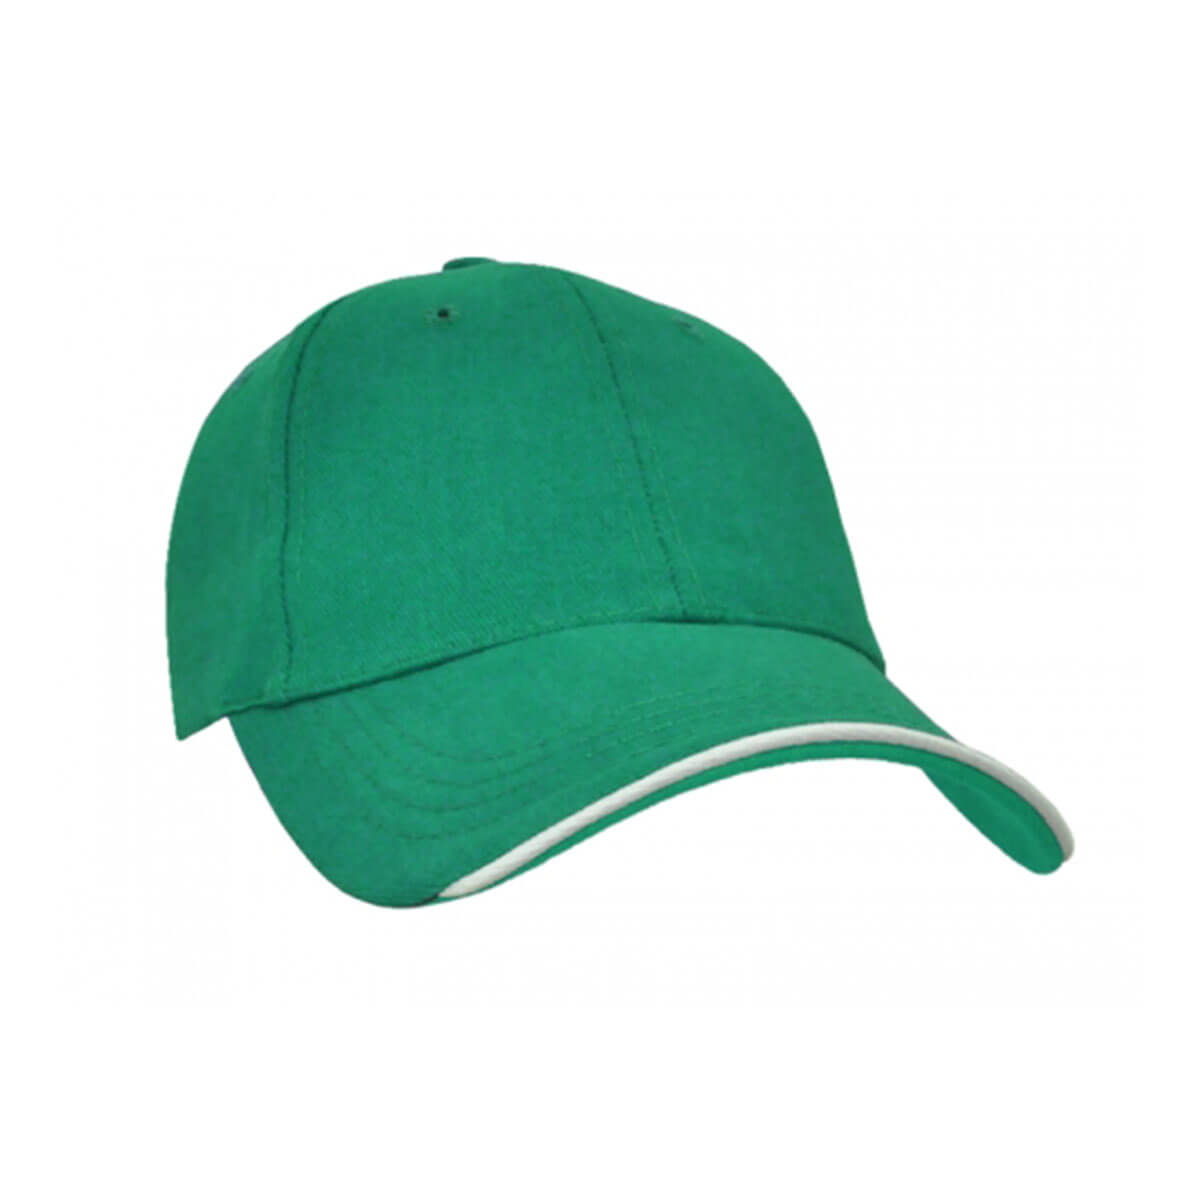 Navigator Cap-Jade / White / Jade